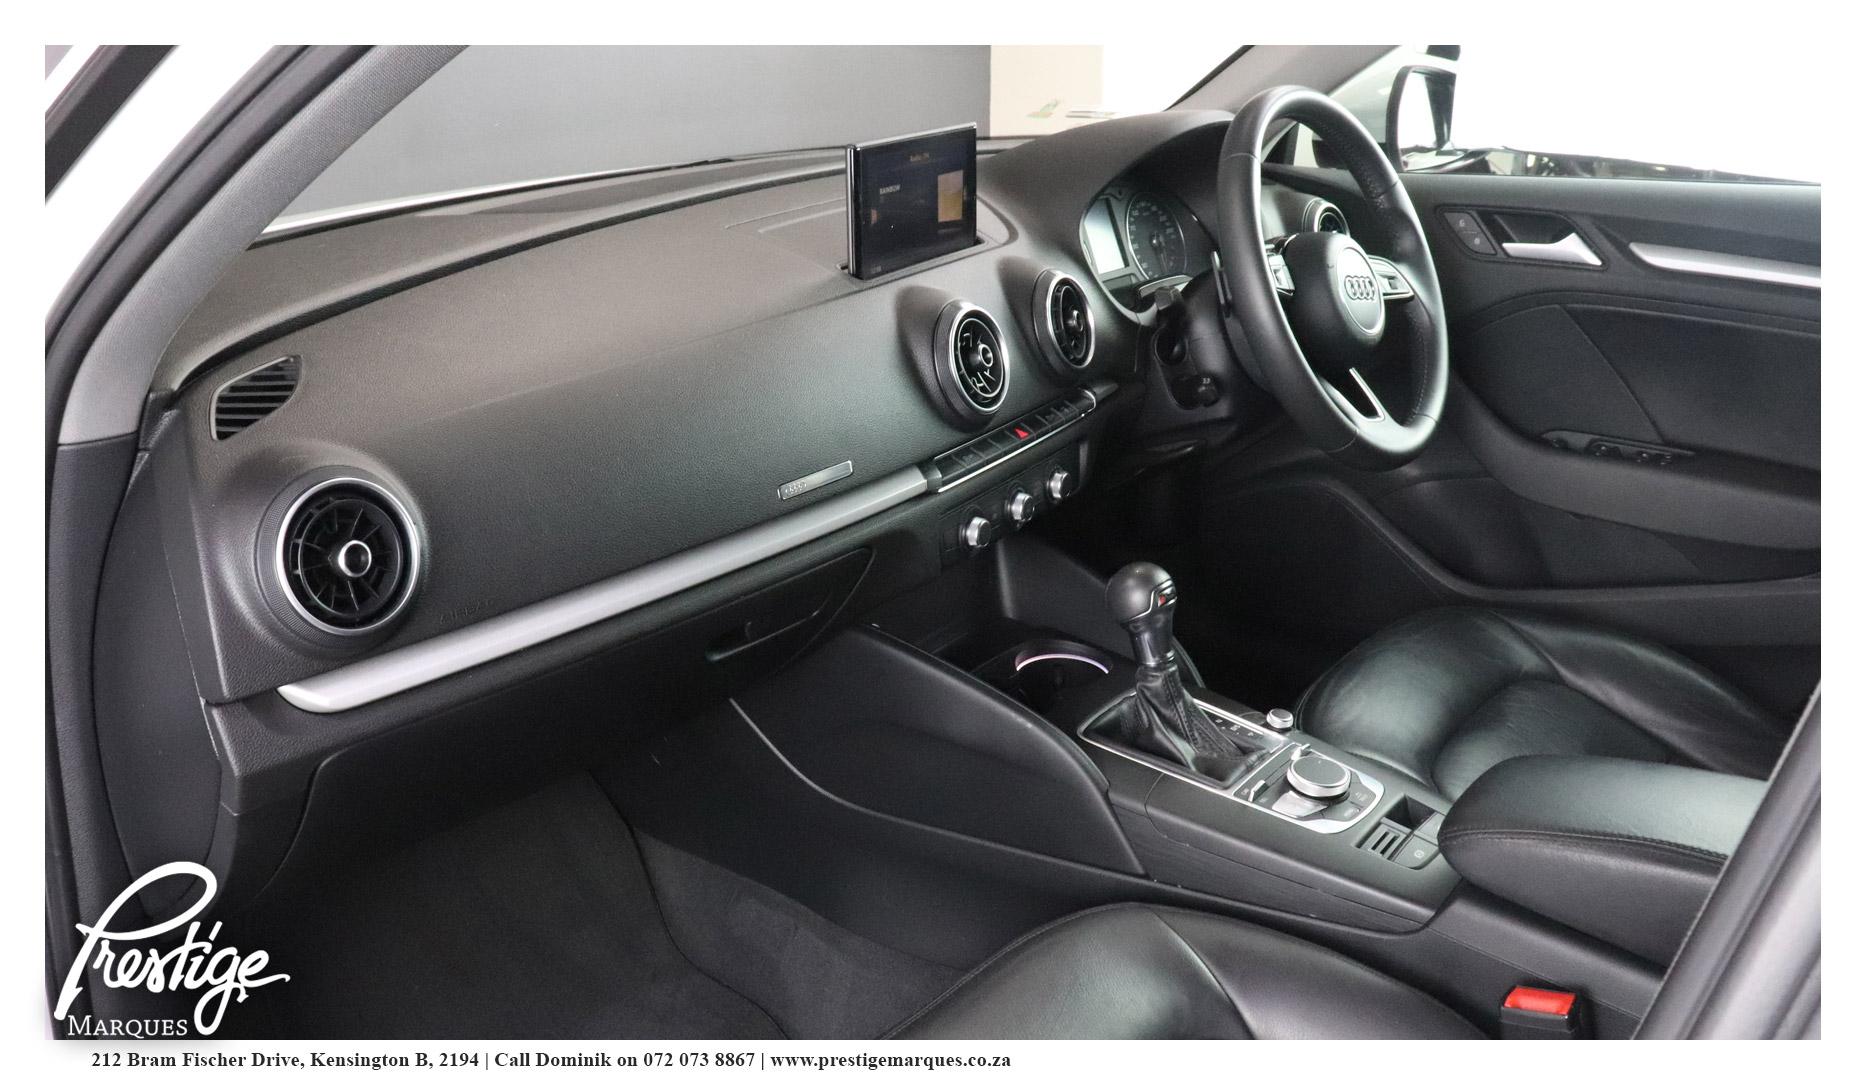 2017-Audi-A3-Sportback-1-4-TFSi-Stronic-Prestige-Marques-Randburg-Sandton-13